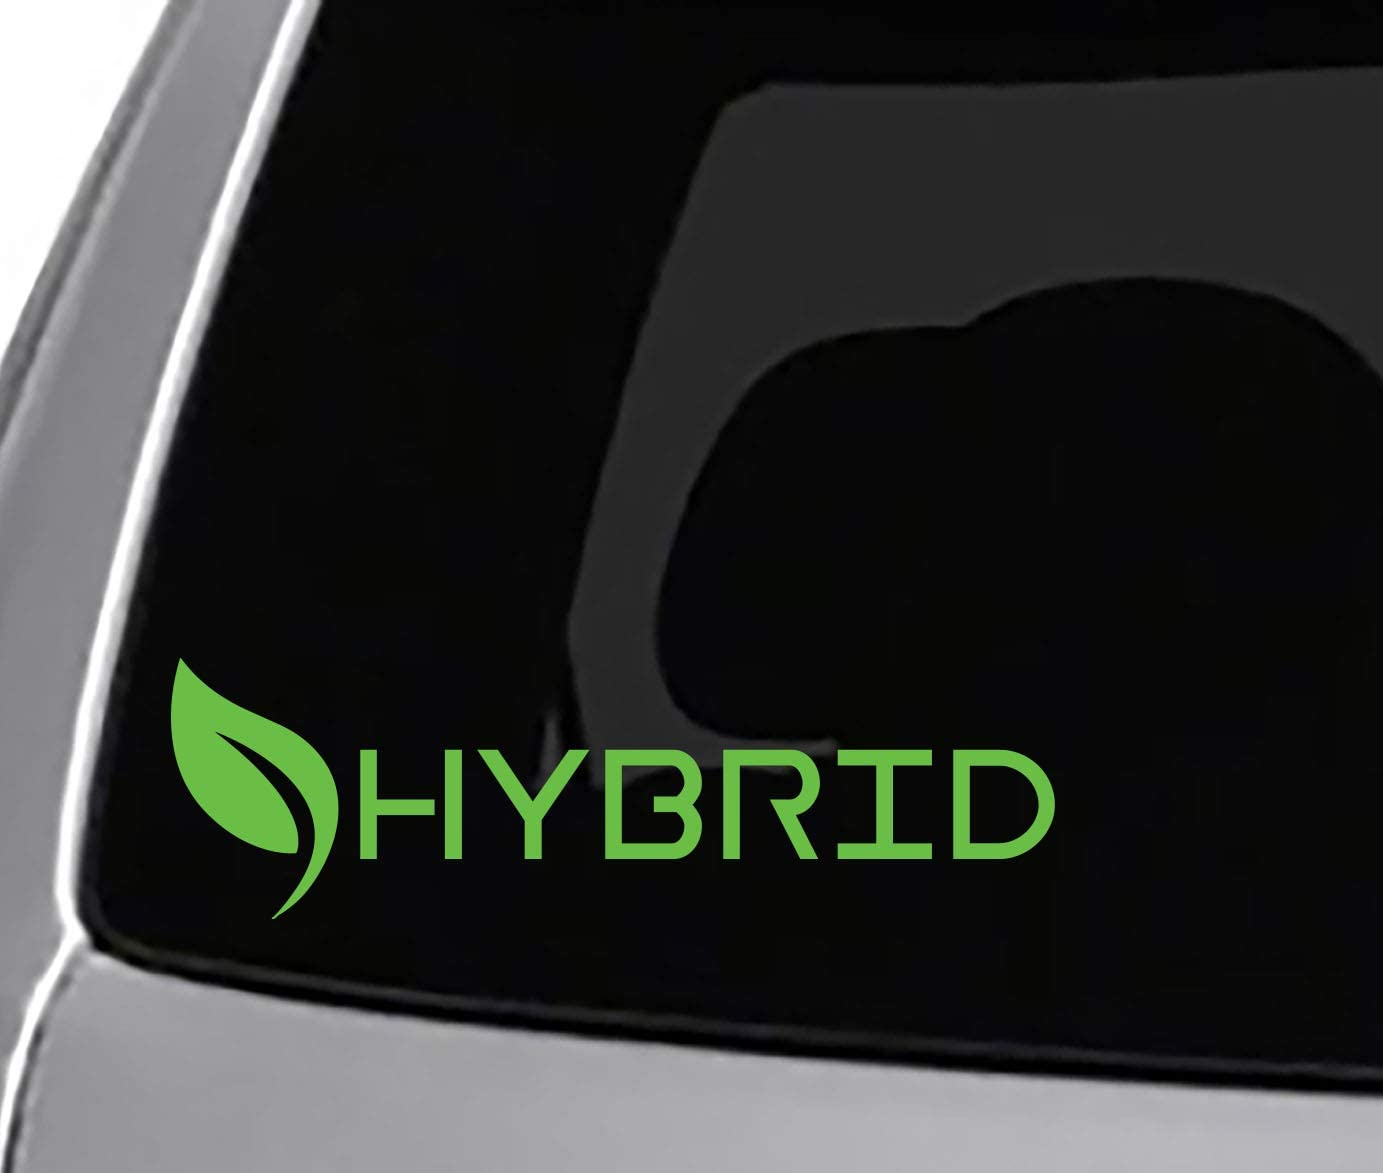 0-60 Eventually Car SUV Window Rear Trunk Bumper Funny Decorative Vinyl Sticker